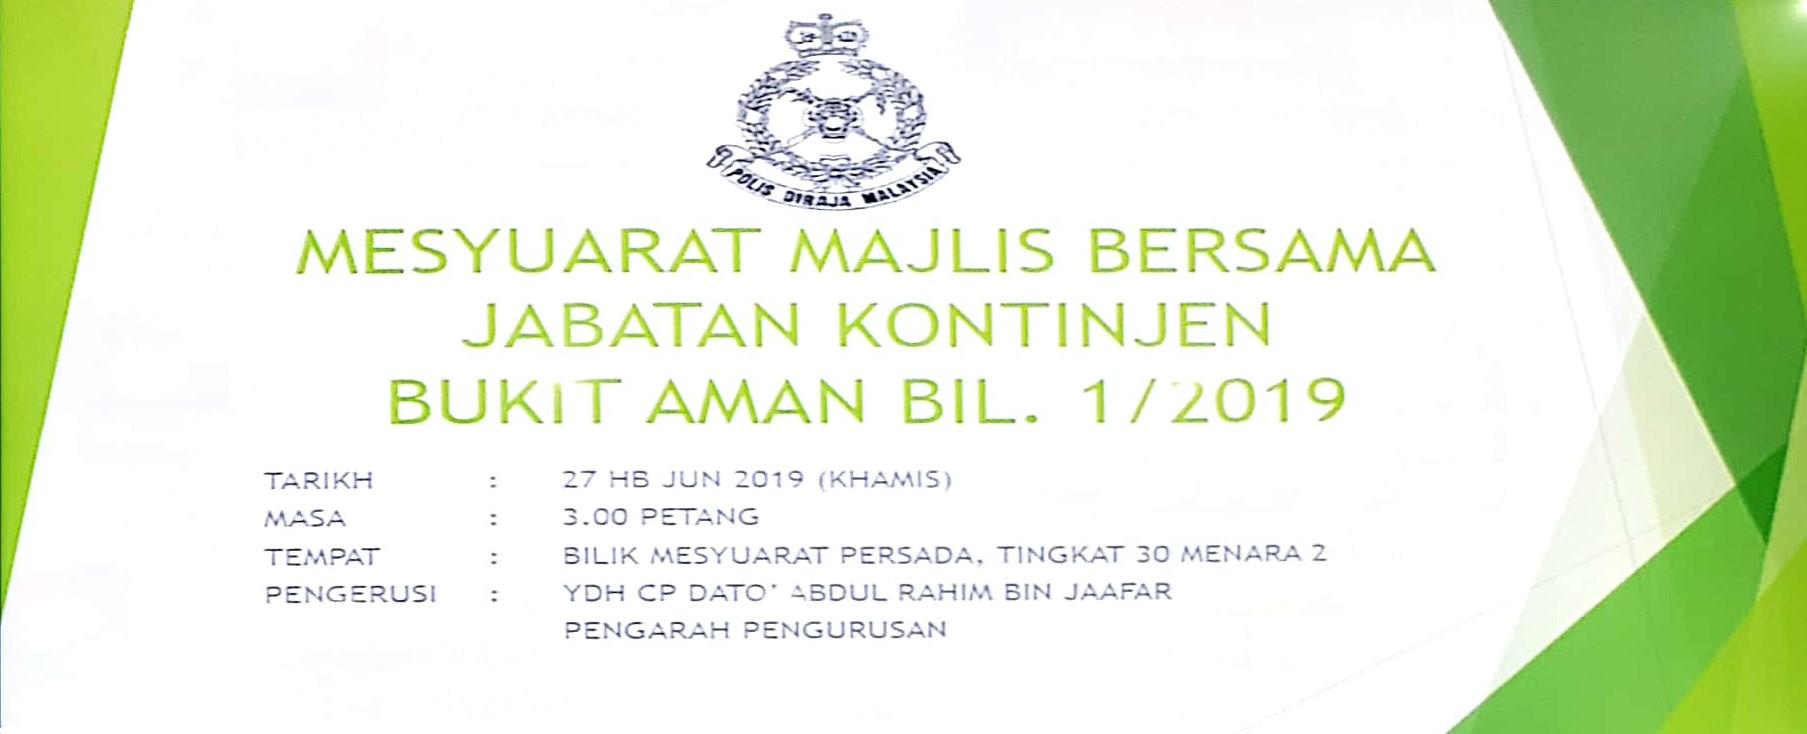 MESYUARAT MBJ KONTINJEN BUKIT AMAN BIL.1 2019